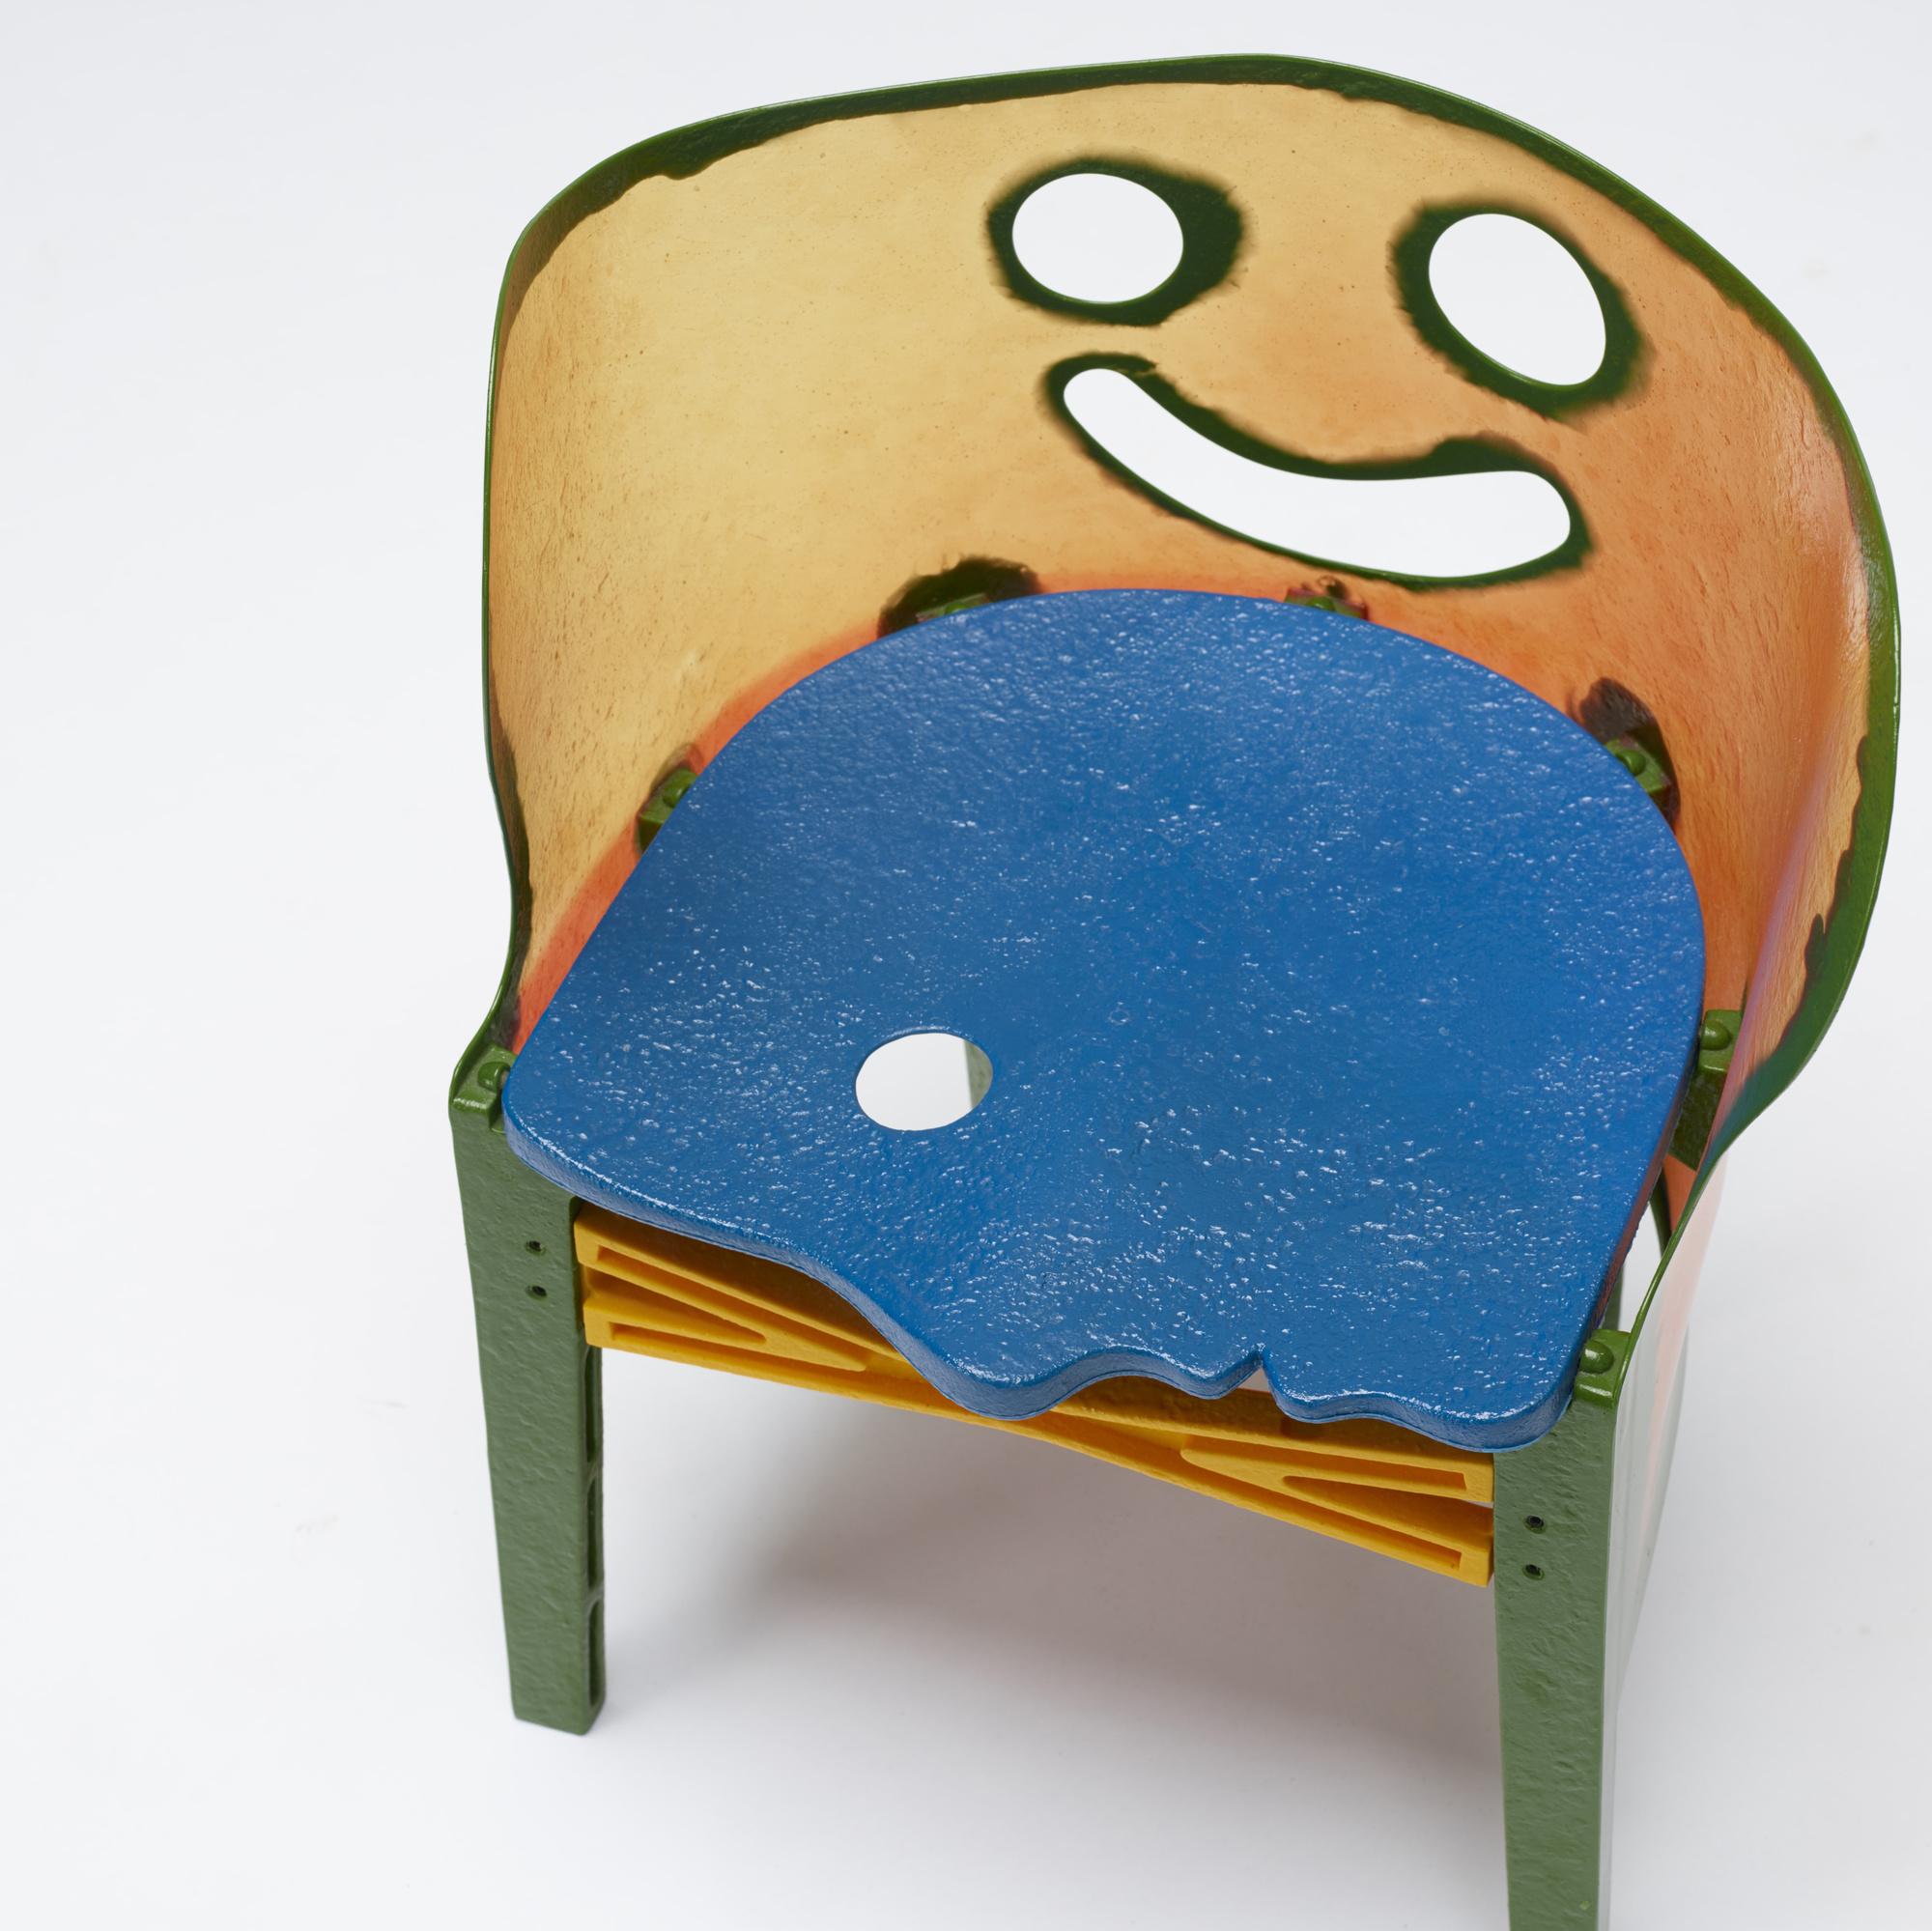 660: Gaetano Pesce / Crosby child's chair (3 of 3)